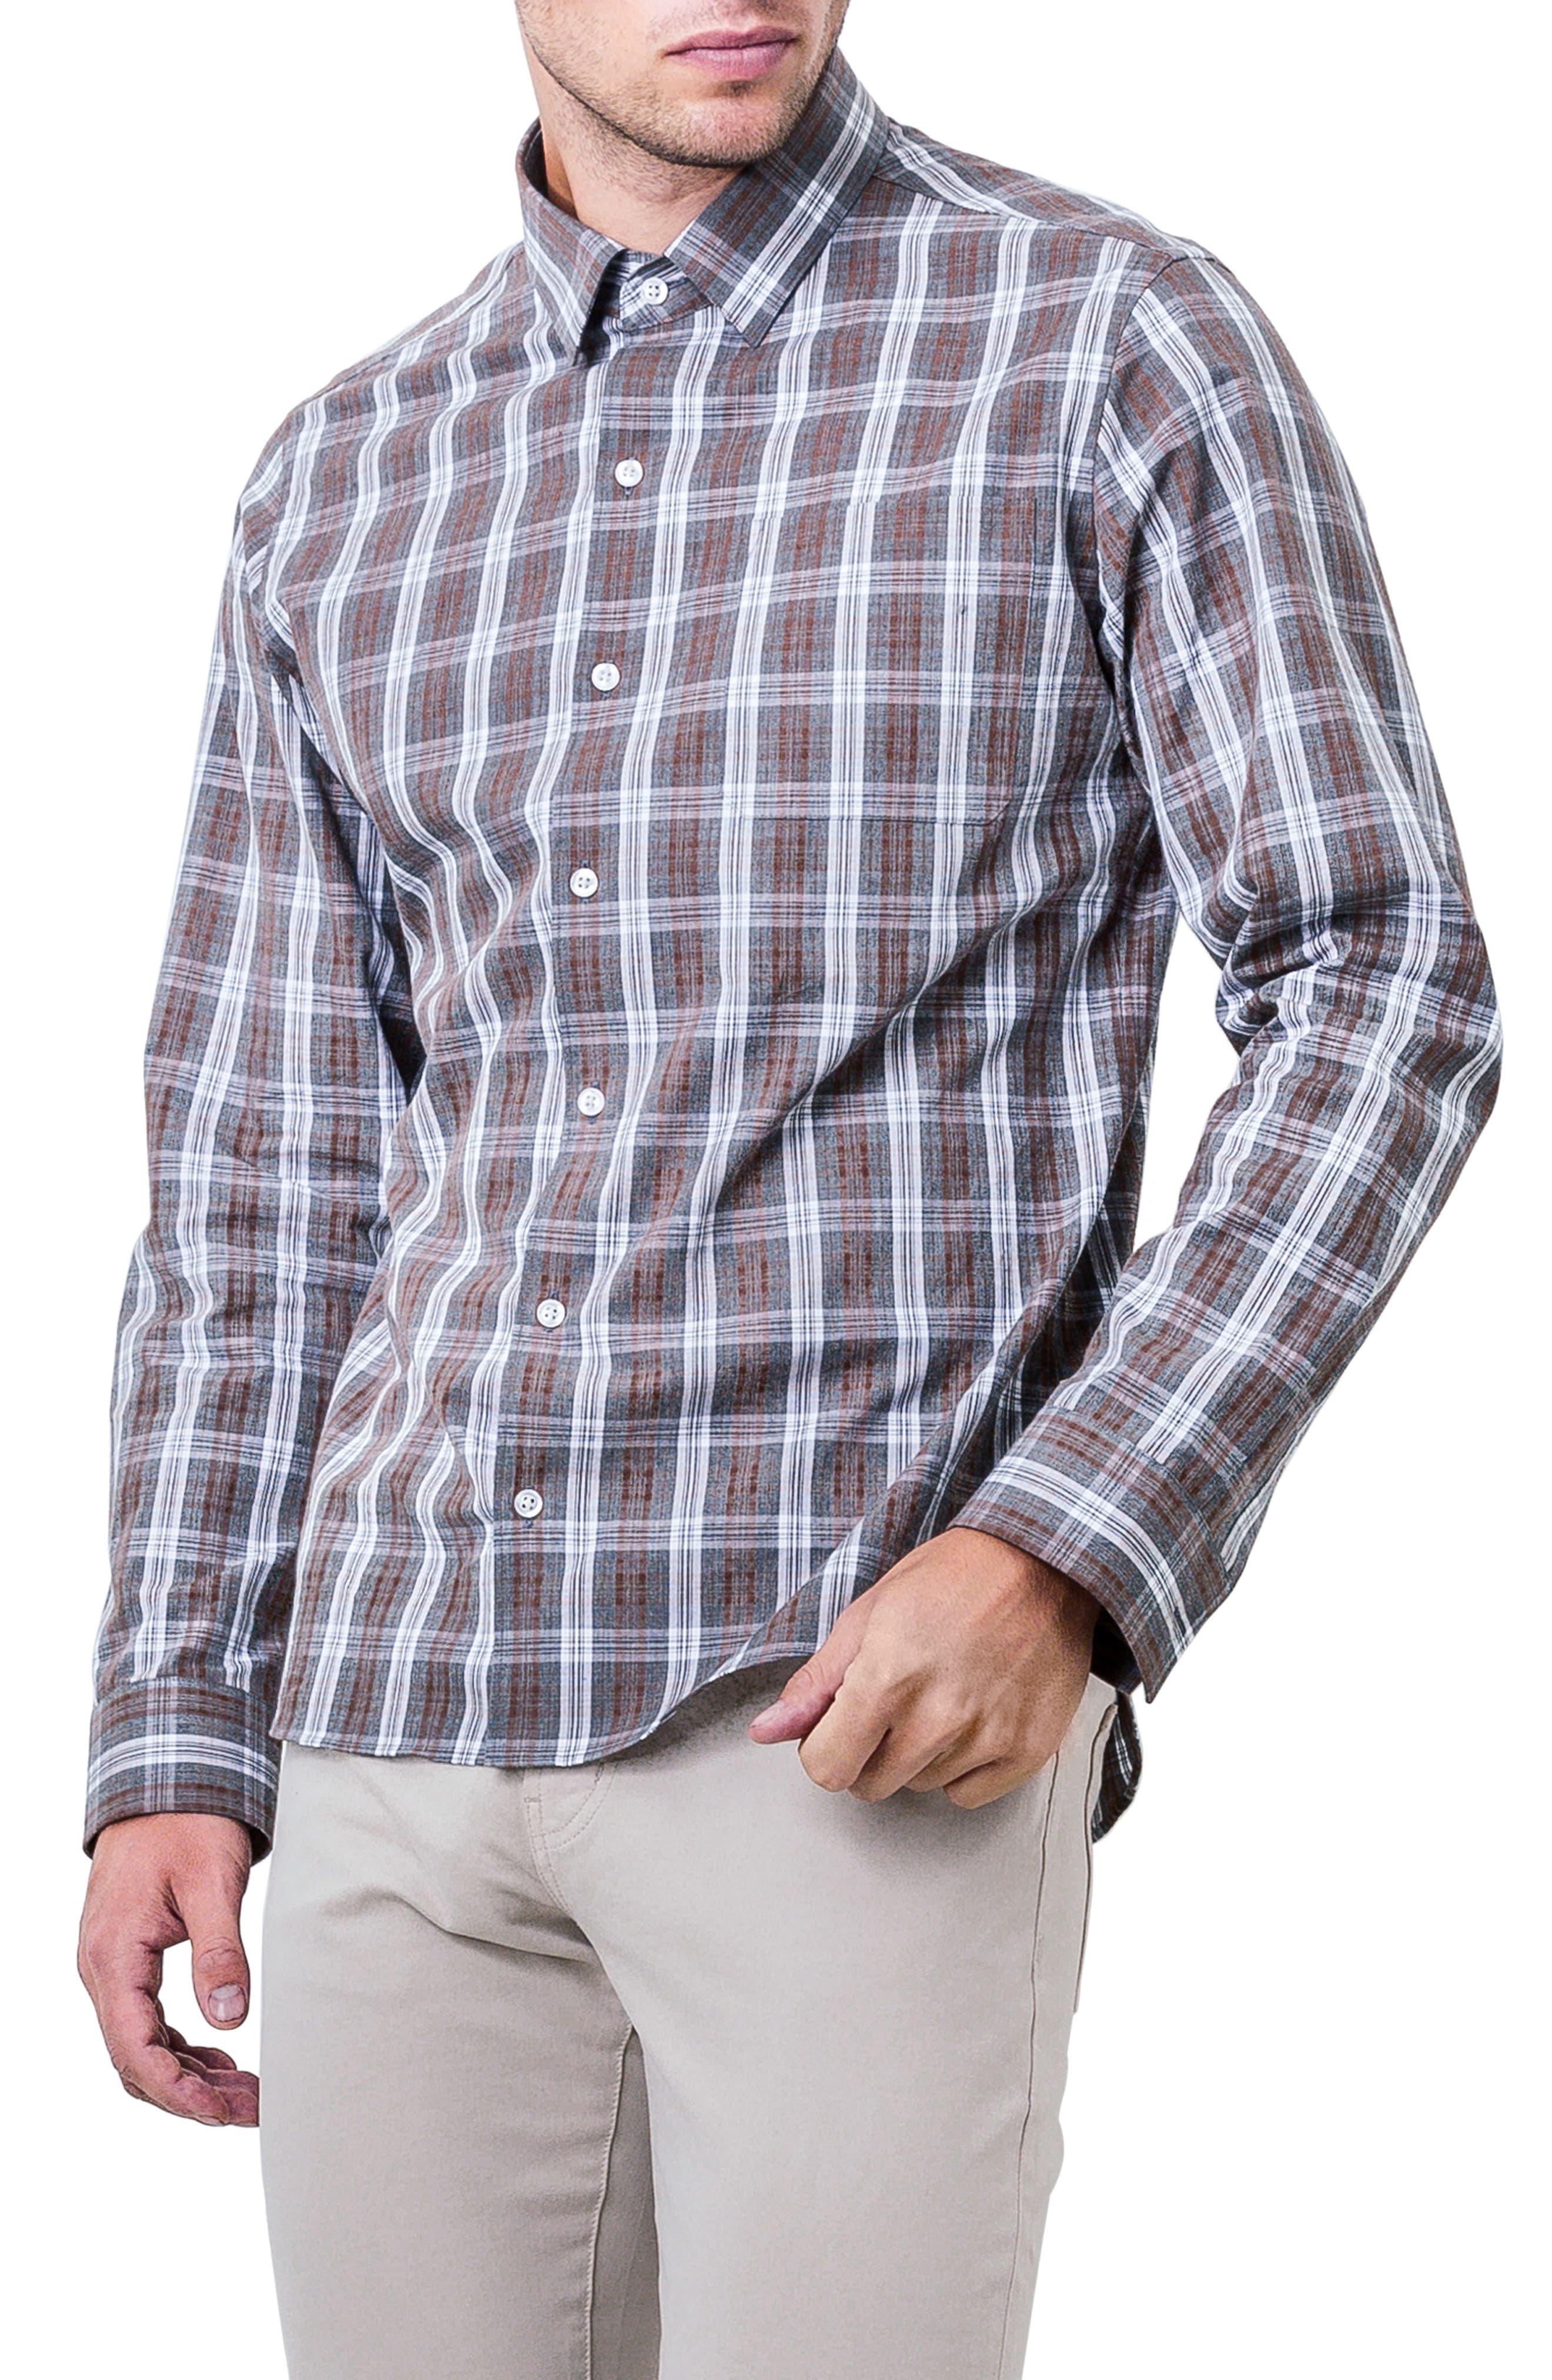 Majesty Plaid Woven Shirt,                             Main thumbnail 1, color,                             BROWN